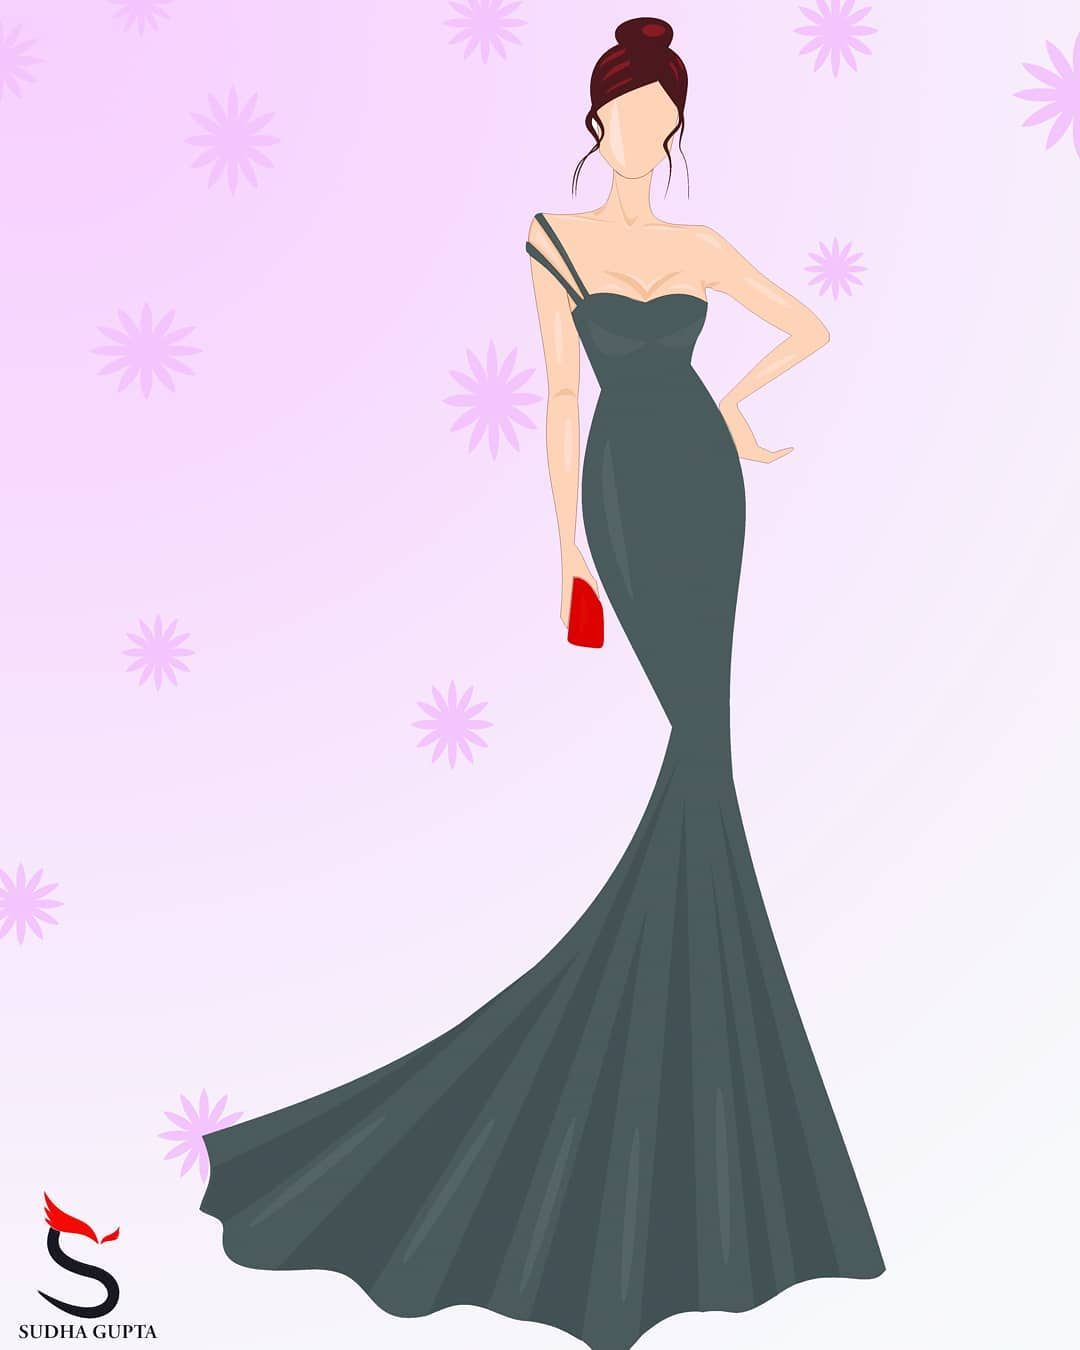 My First Fashionillustration On Coreldraw Coreldrawx7 Greydress Partywear Srgillustrations Fashiondesigner Fashion Design Fashion Illustration Partywear